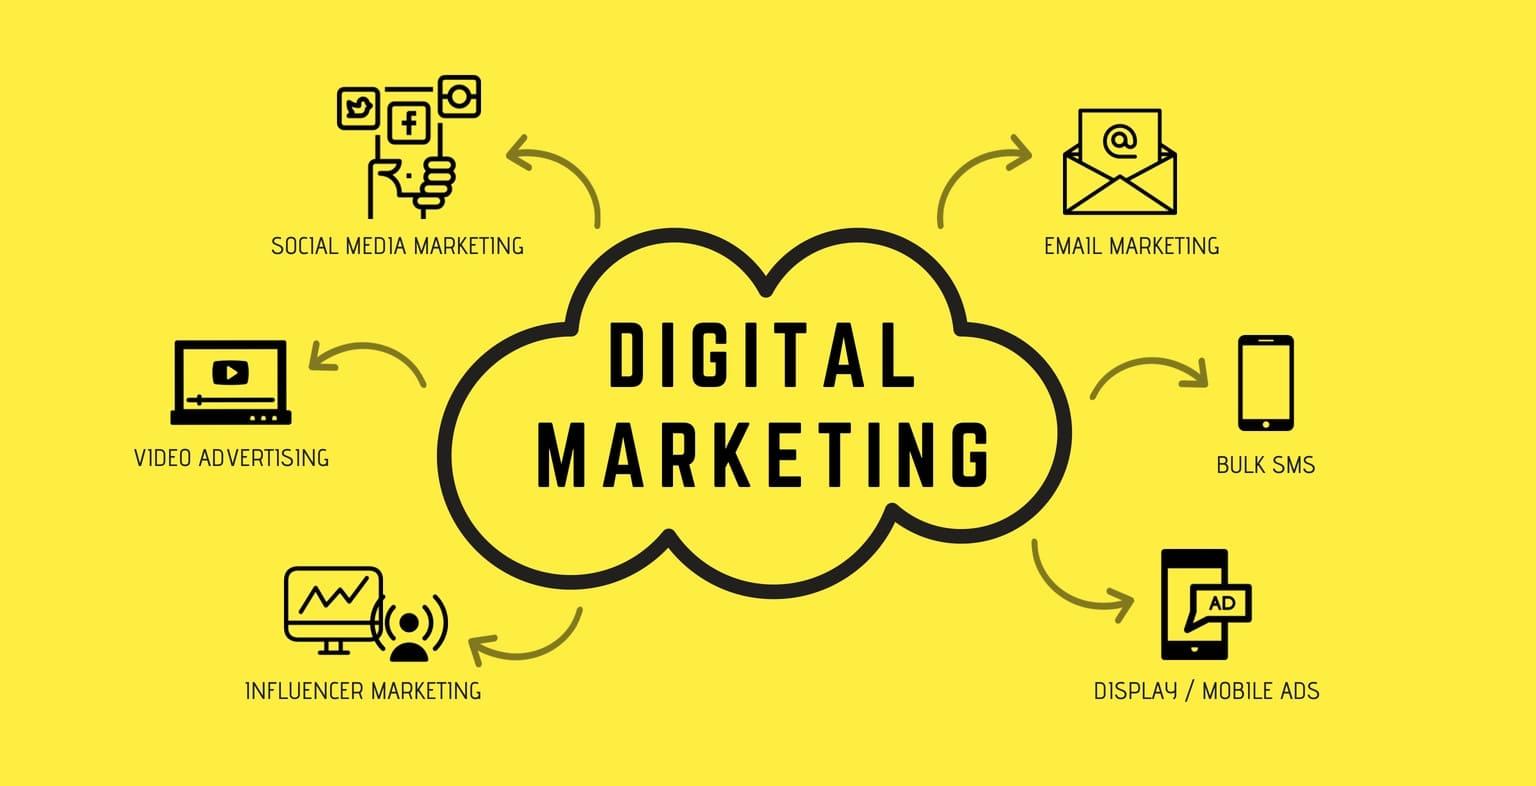 دیجیتال مارکتینگ ، مشاوره حرفه ای دیجیتنال مارکتینگ در تهران کرج تلفنی ، انلاین ، بازاریابی انلاین , بازاربابی دیجیتال , بازاریابی حرفه ای در کرج و تهران